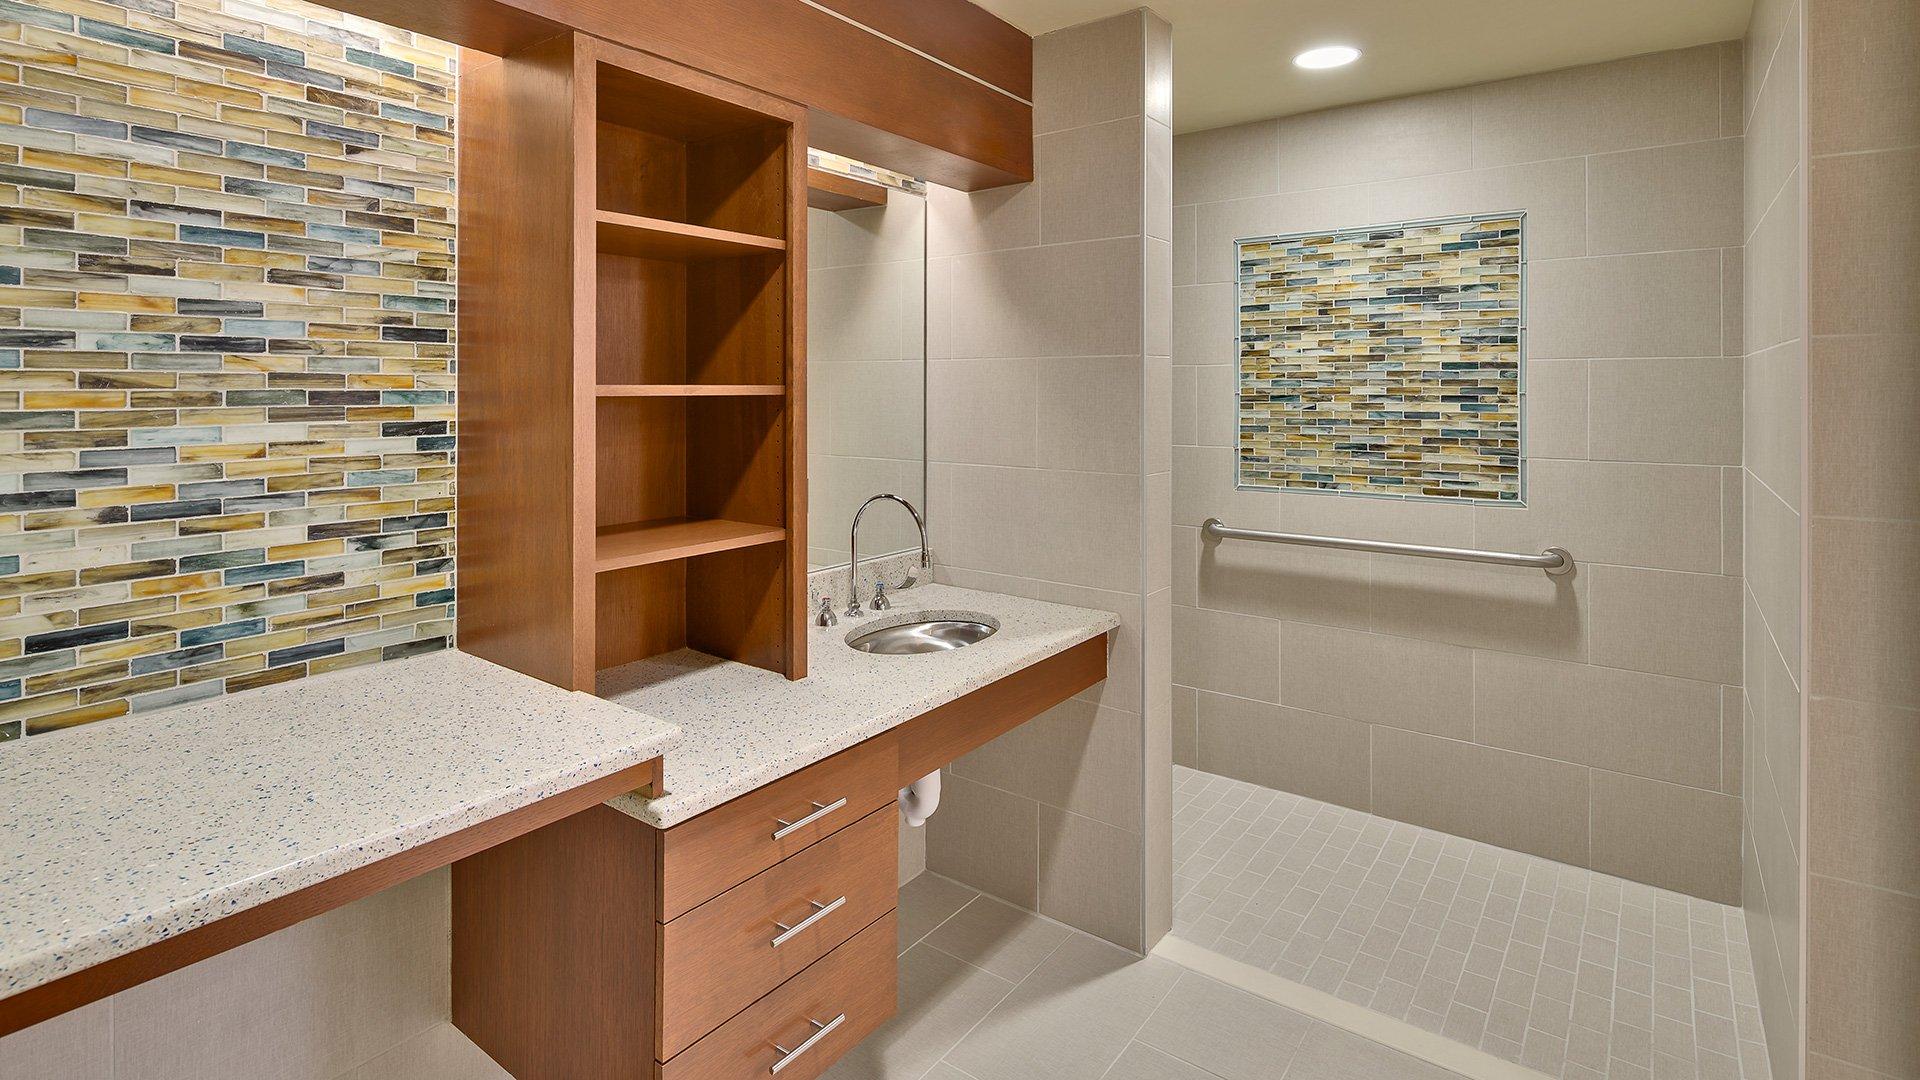 Greenville Health System, Birthing Tub Room, Bathroom